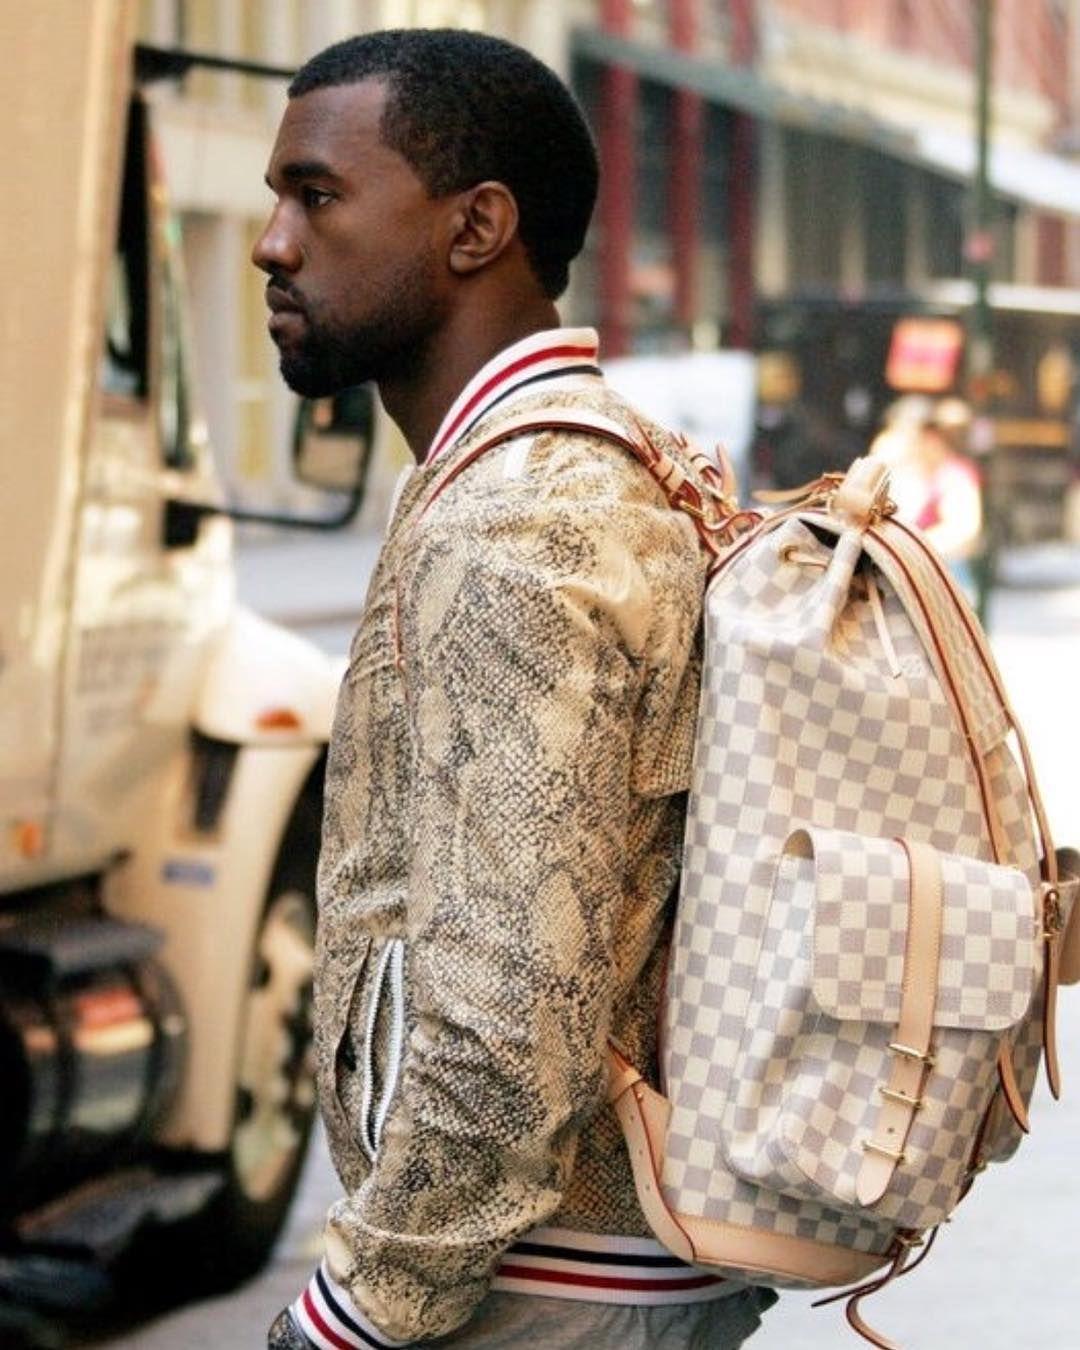 Mslv On Instagram Louis Vuitton Kanye West X Damier Azur Backpack In 2020 Louis Vuitton Backpack Louis Vuitton Louis Vuitton Men